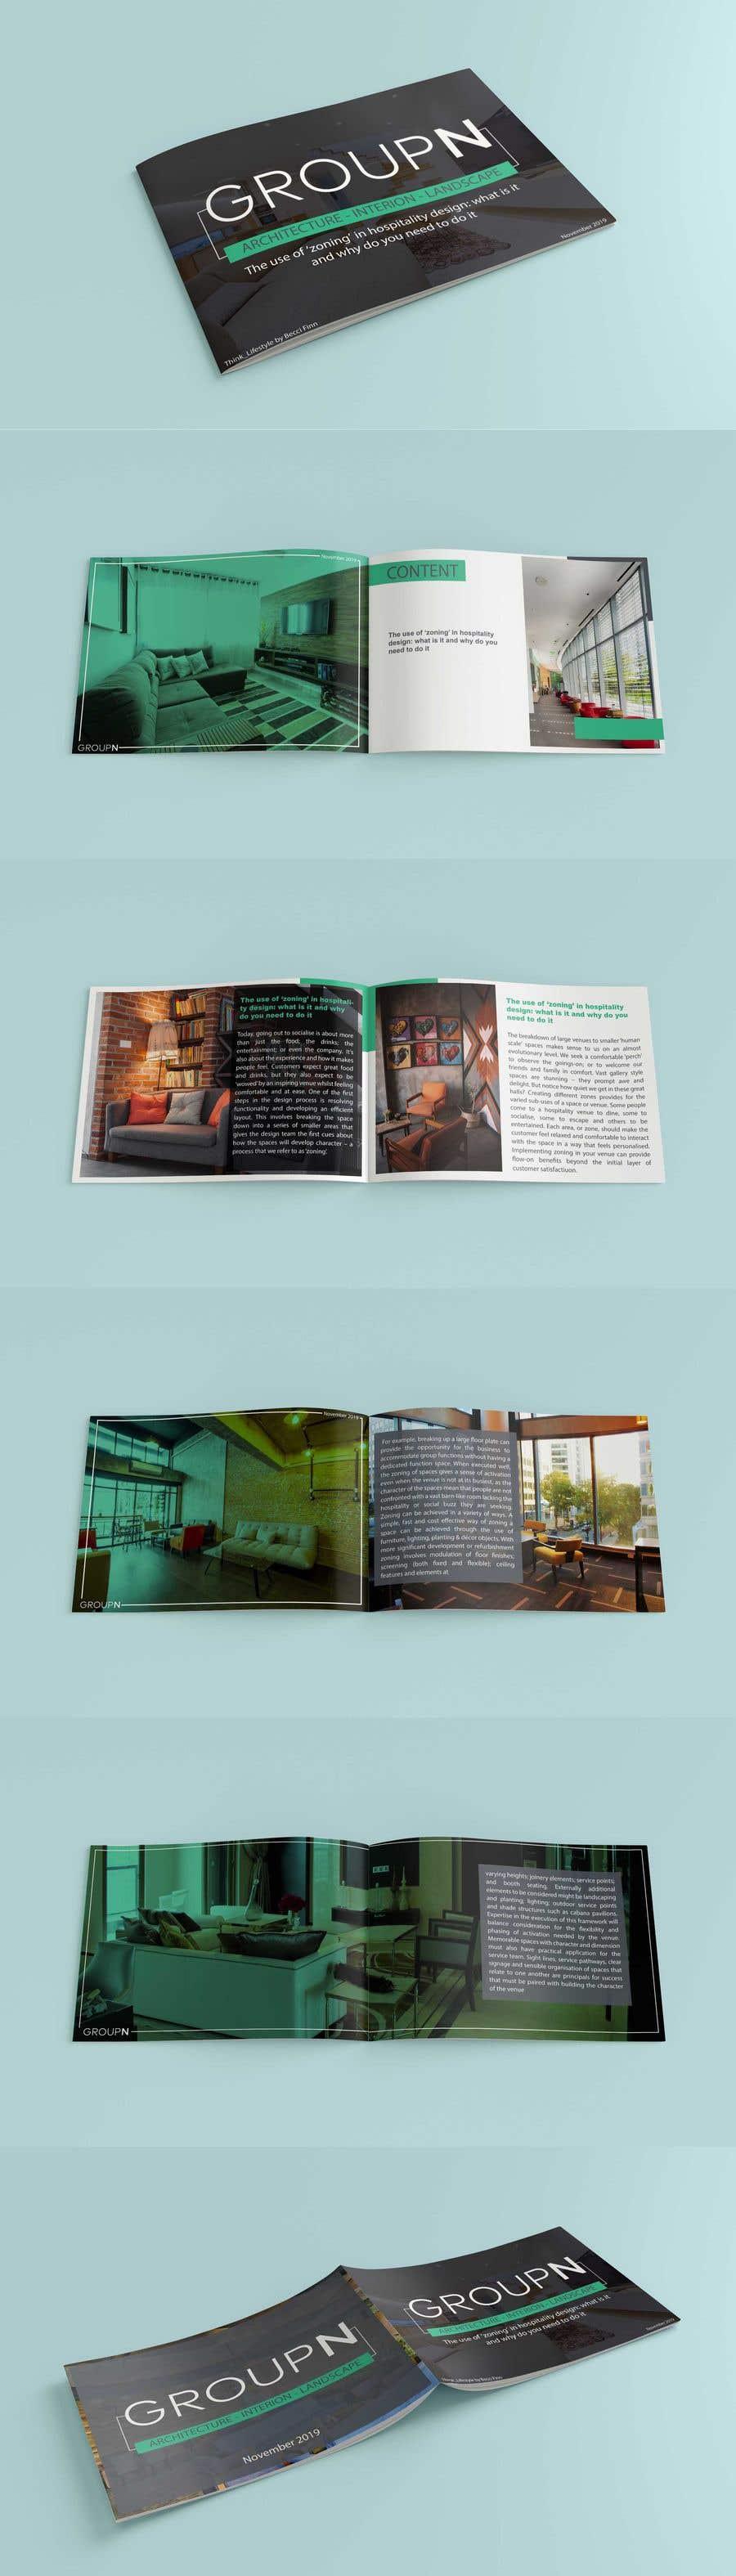 Kilpailutyö #12 kilpailussa Design template for whitepapers